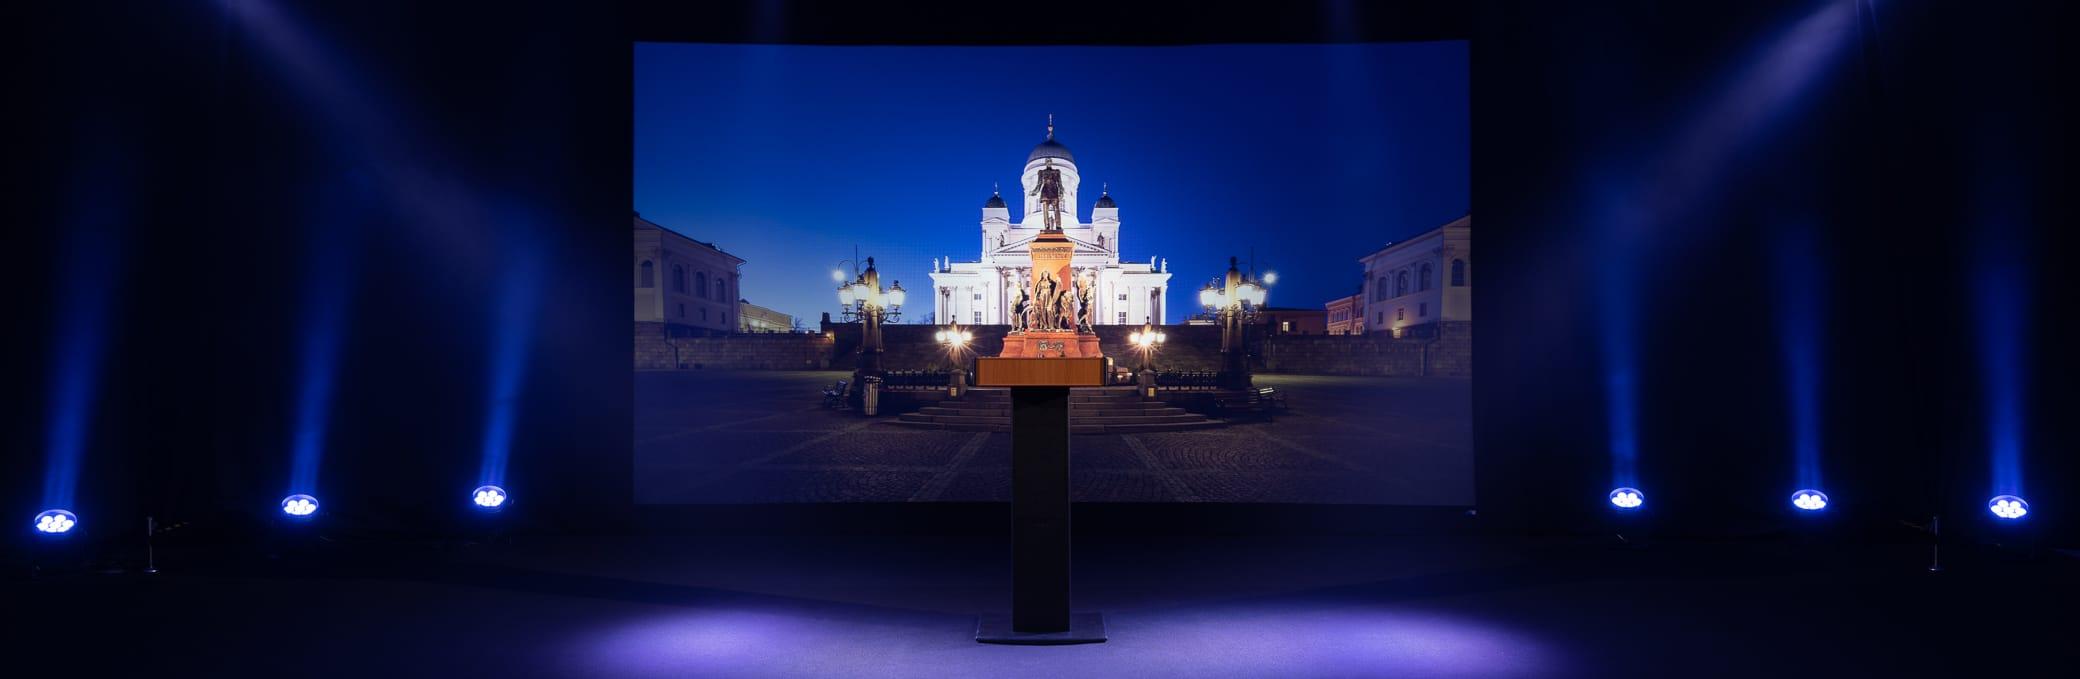 Suomen Kongressitekniikka Oy | Striimausstudio